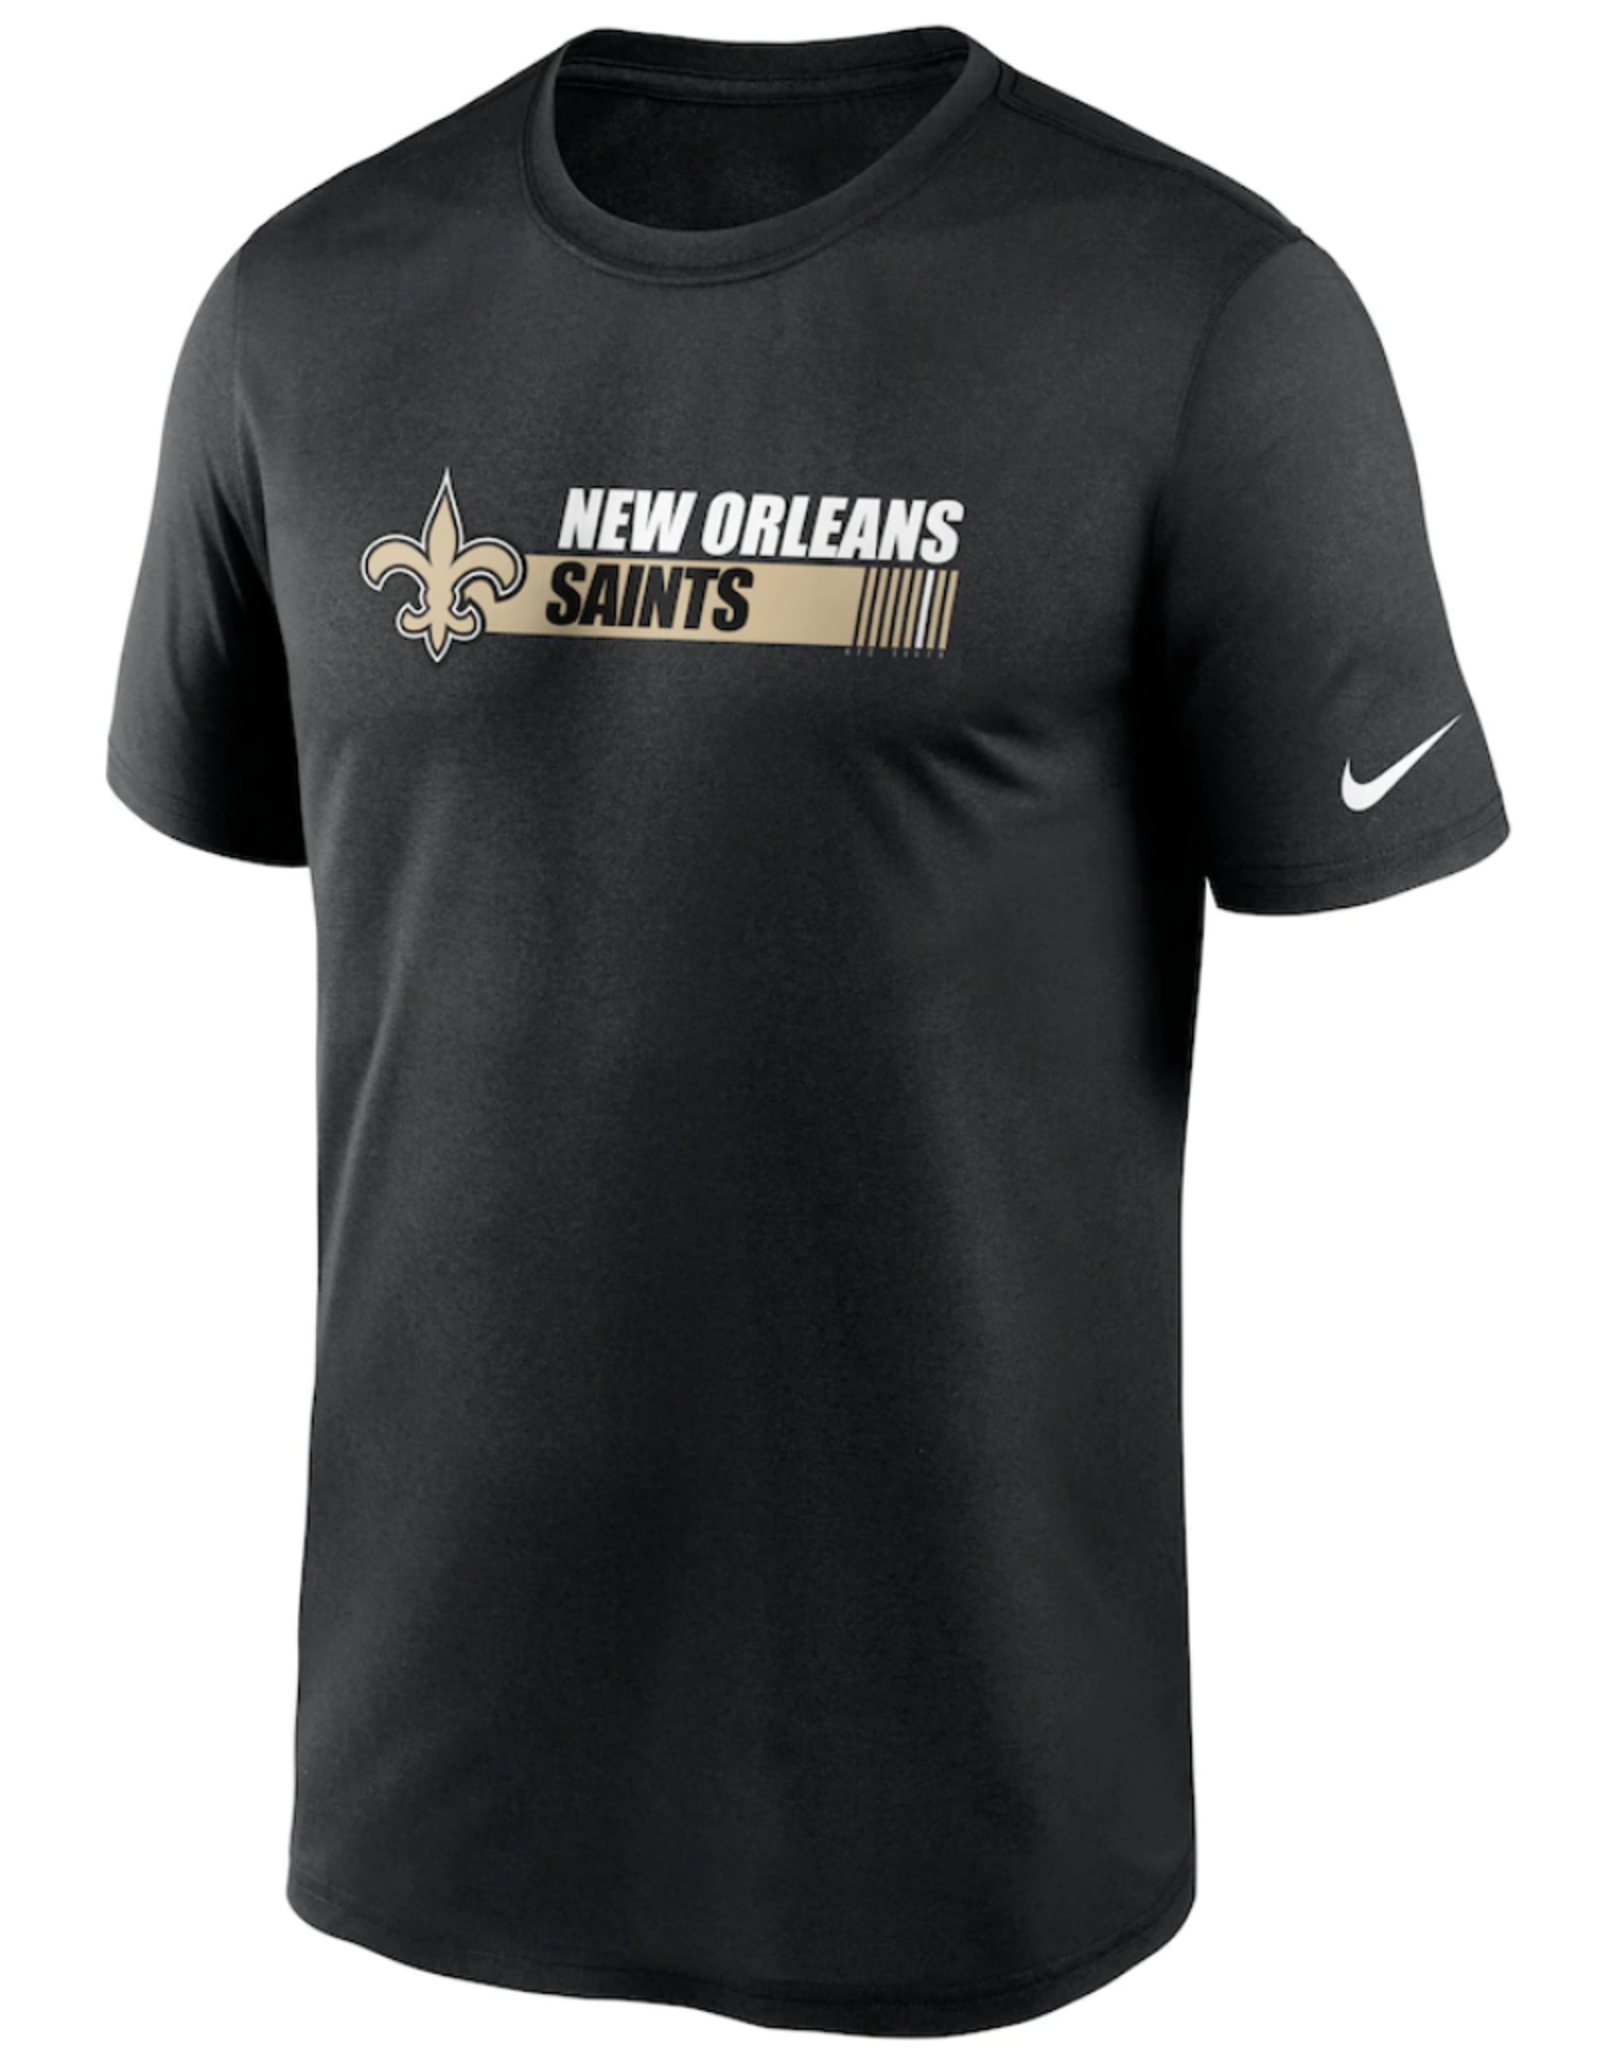 Nike Men's Team Conference T-Shirt New Orleans Saints Black